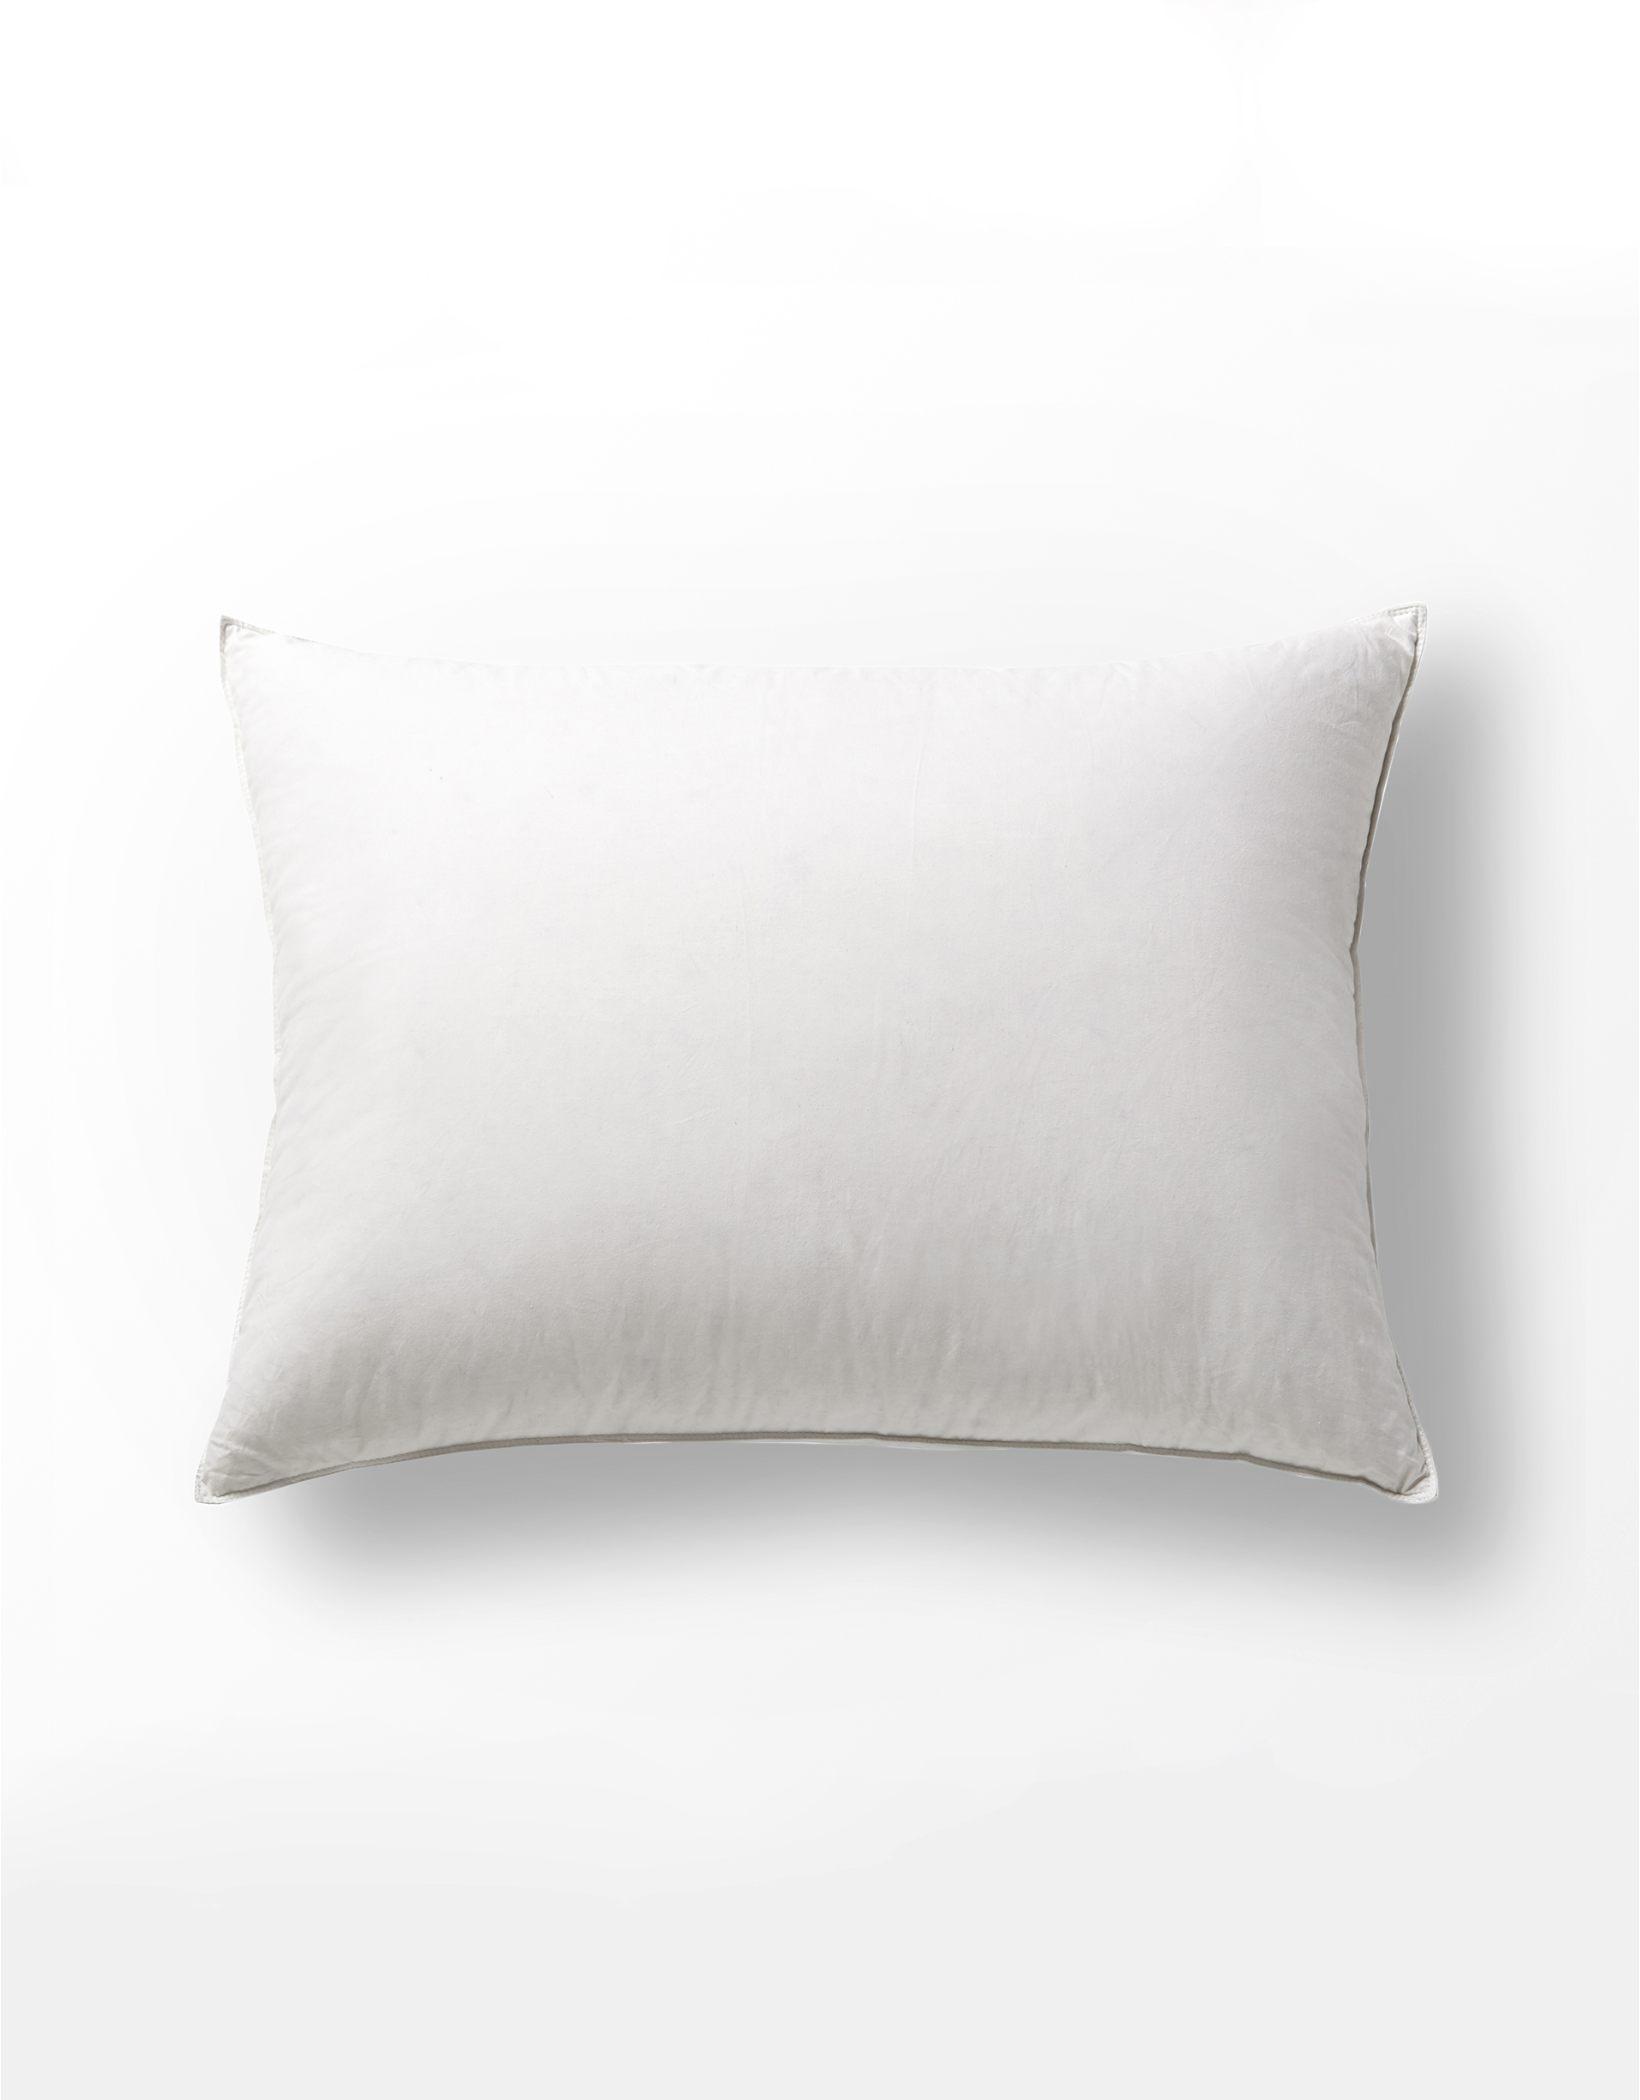 Dormify Down Alternative Pillow